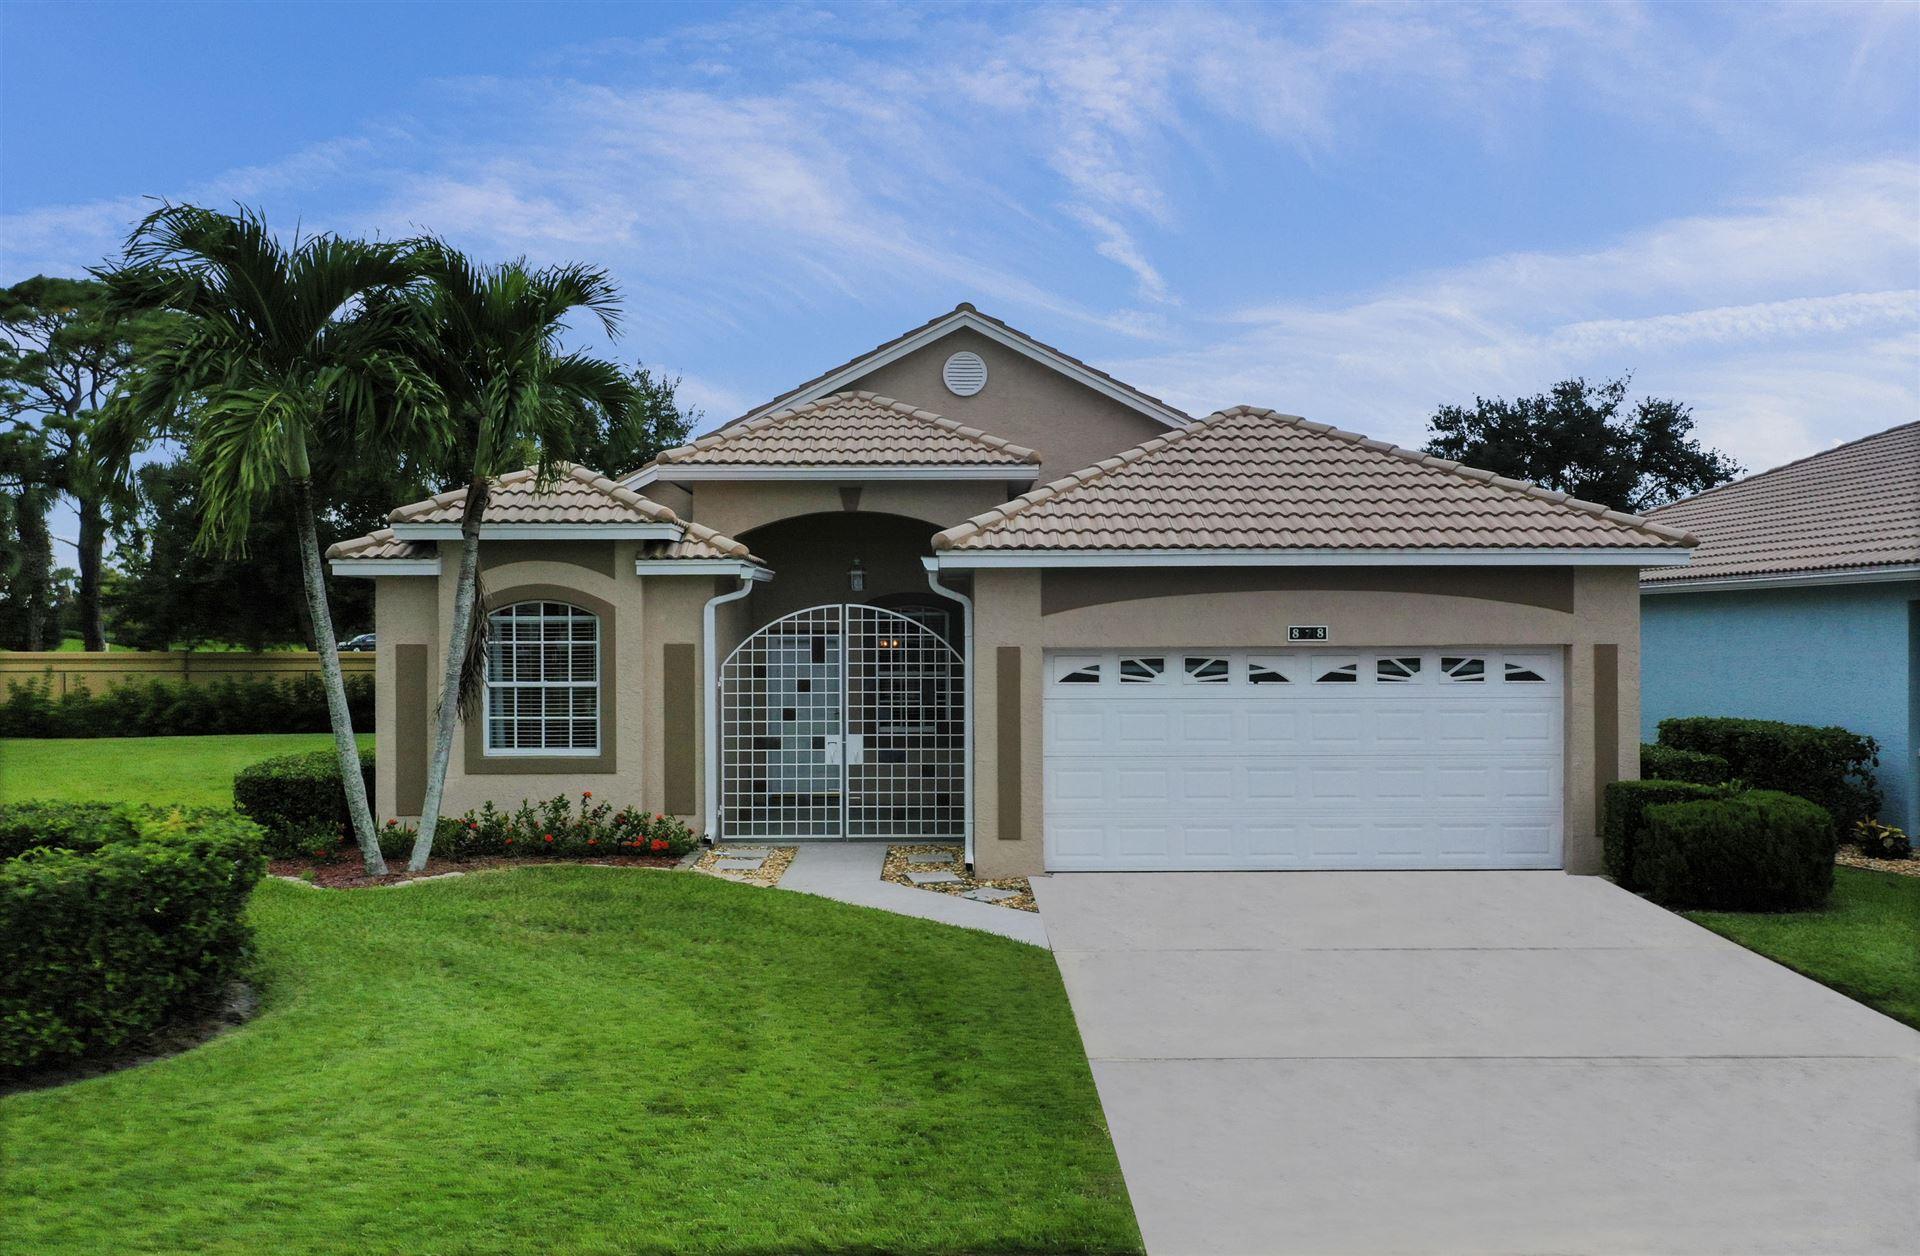 878 NW Sarria Court, Port Saint Lucie, FL 34986 - #: RX-10654007